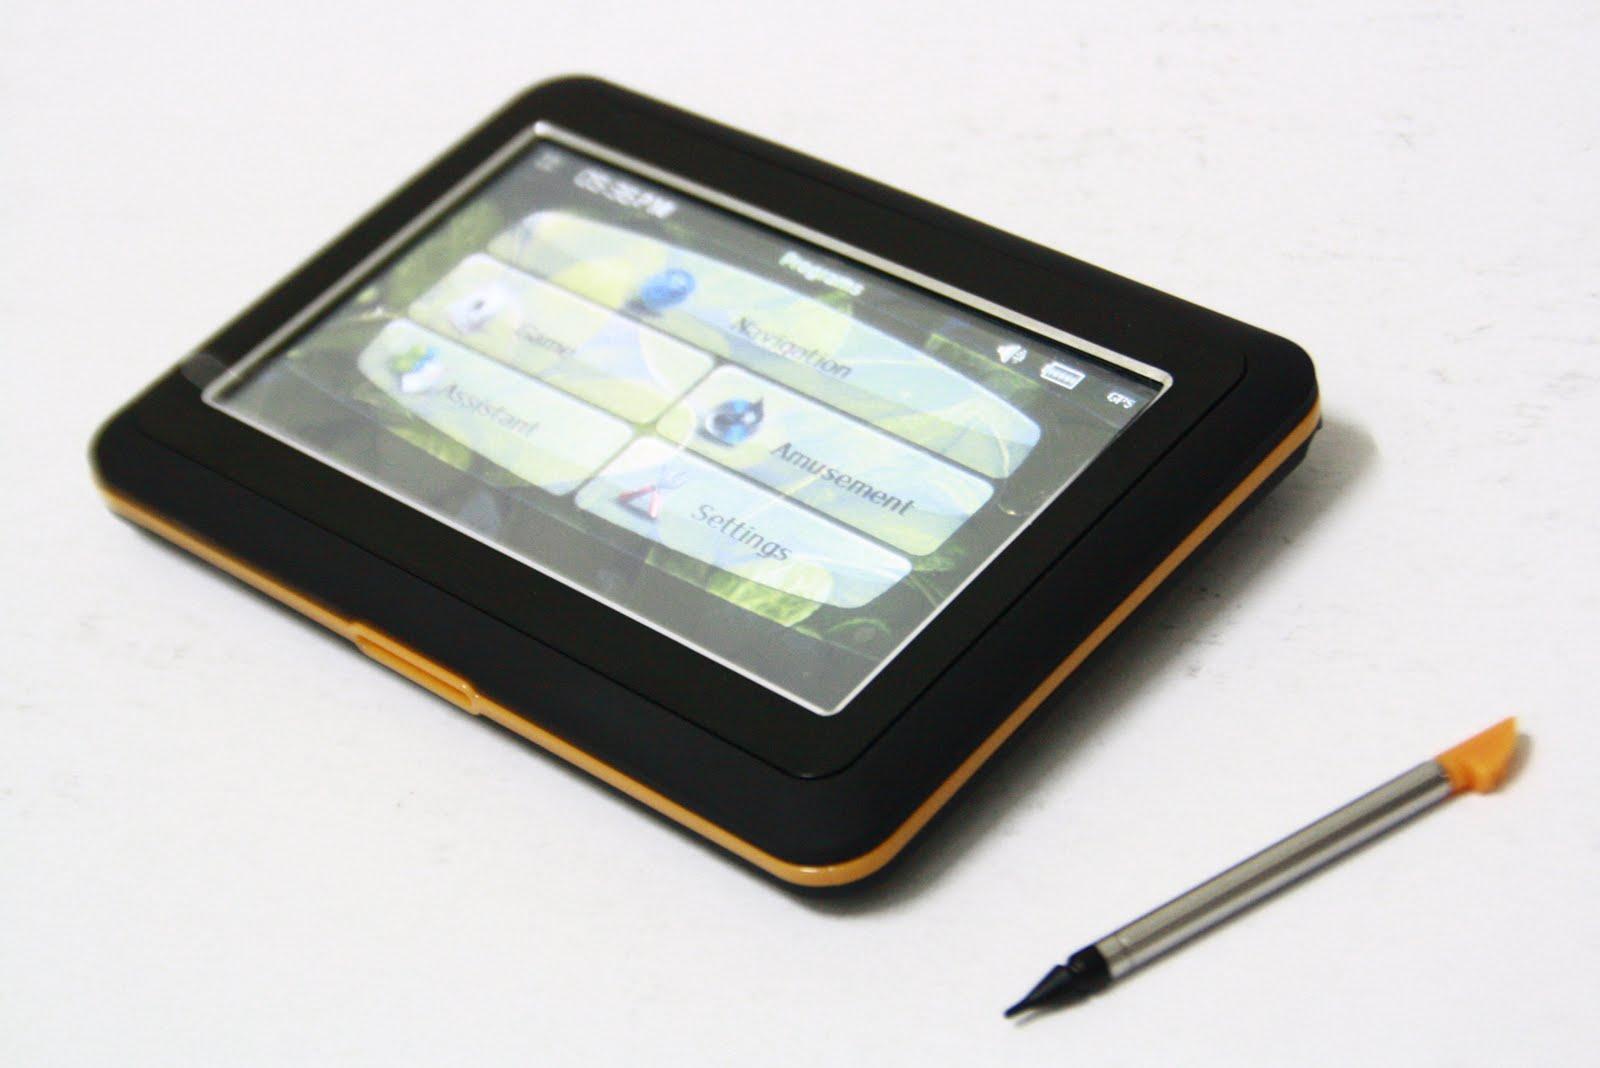 GPS Unit - Garmin, PapagoX3, PapagoX5, iGO, MapKing | Zerotohundred